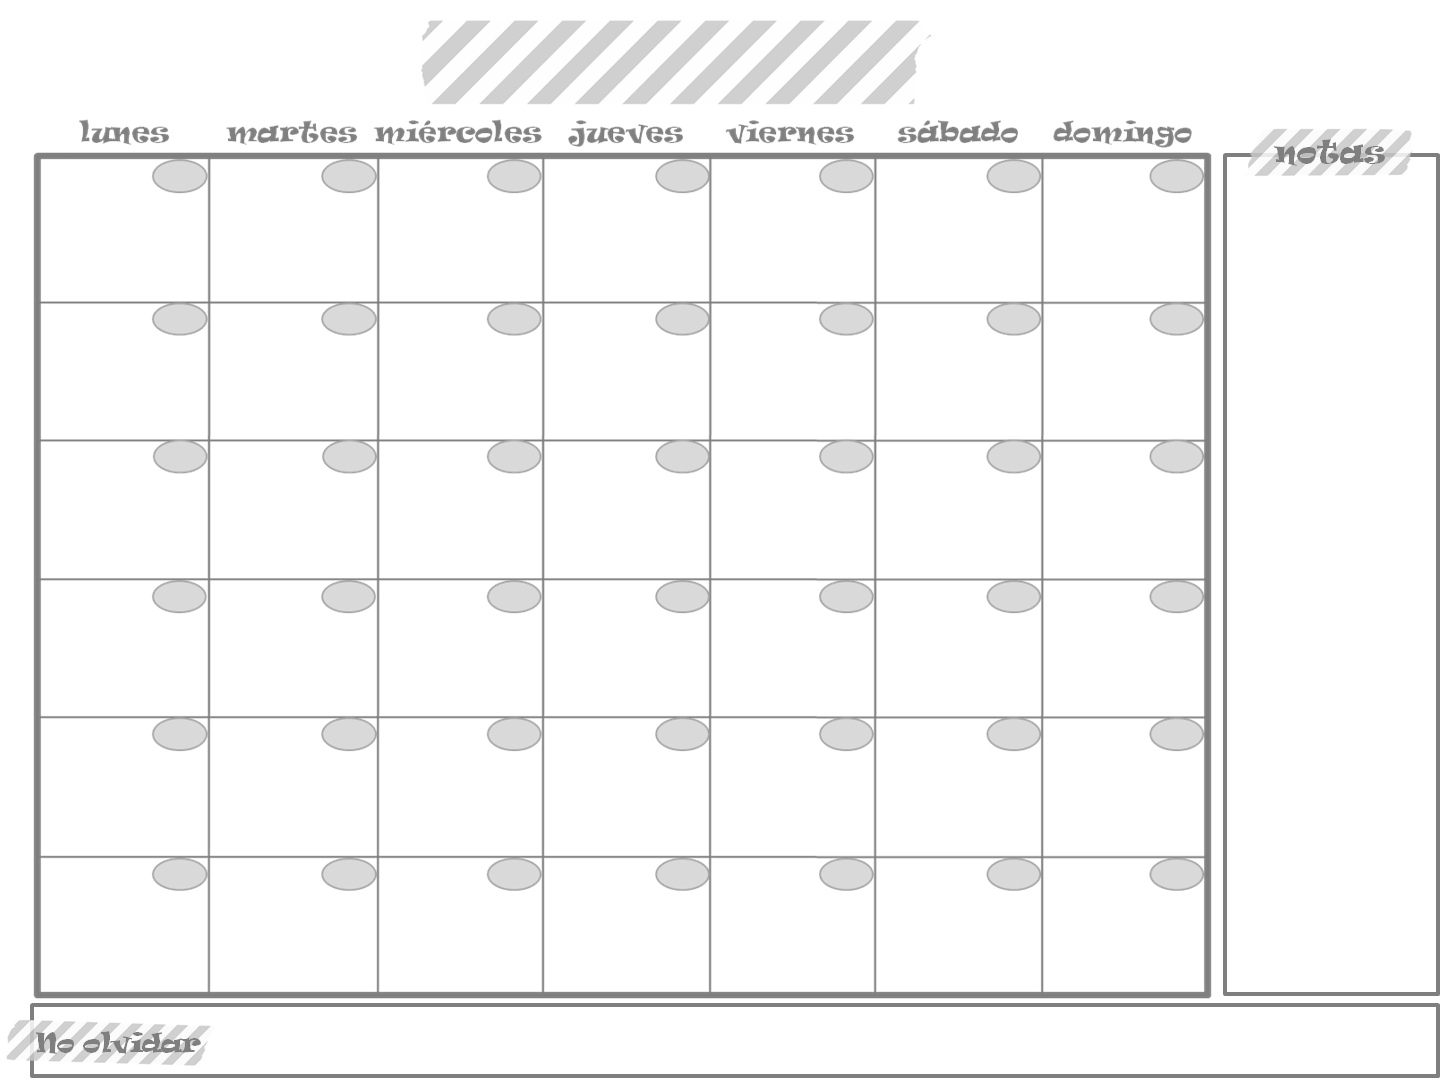 Calendario En Blanco.Calendario Escolar 2017 2018 Mas De 100 Imagenes Para Descargar Gratis